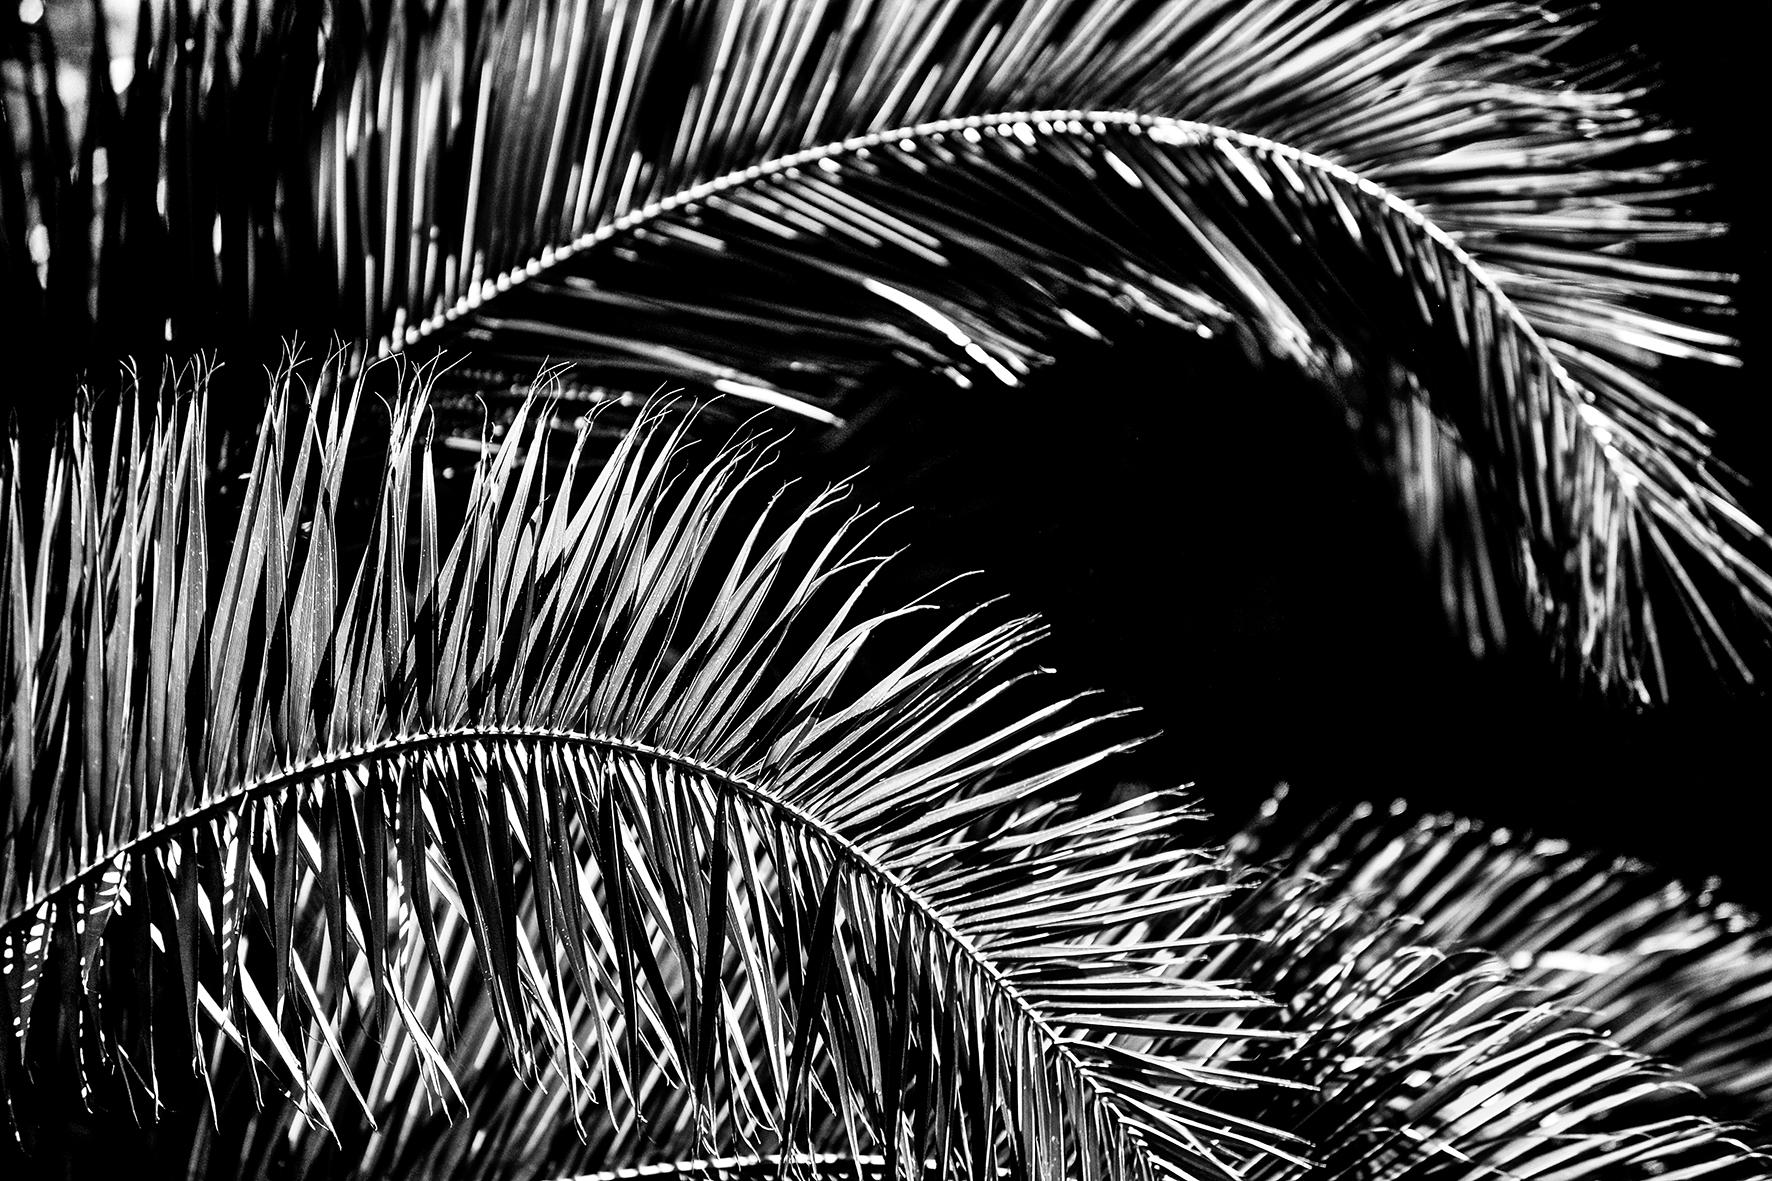 Photographe : Le graphisme naturel n°4